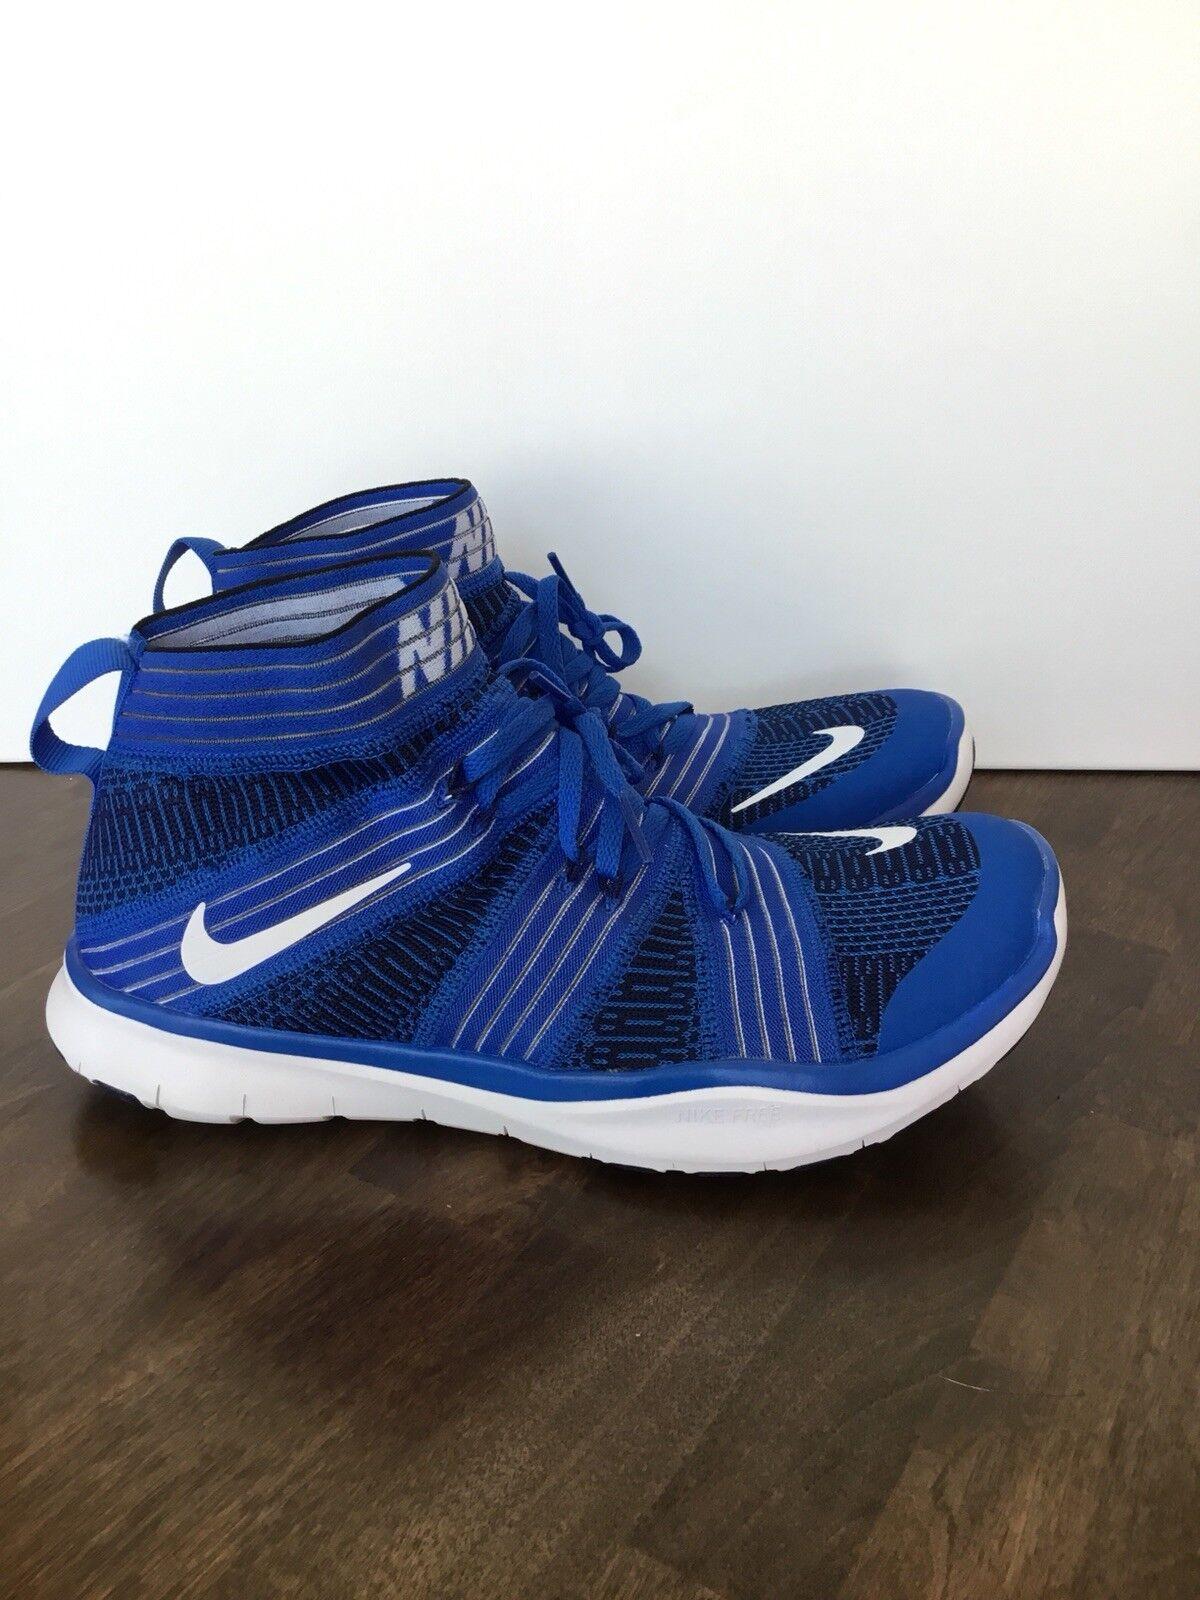 Nike libera treno virtù Uomo dimensioni scarpe bianco & blu